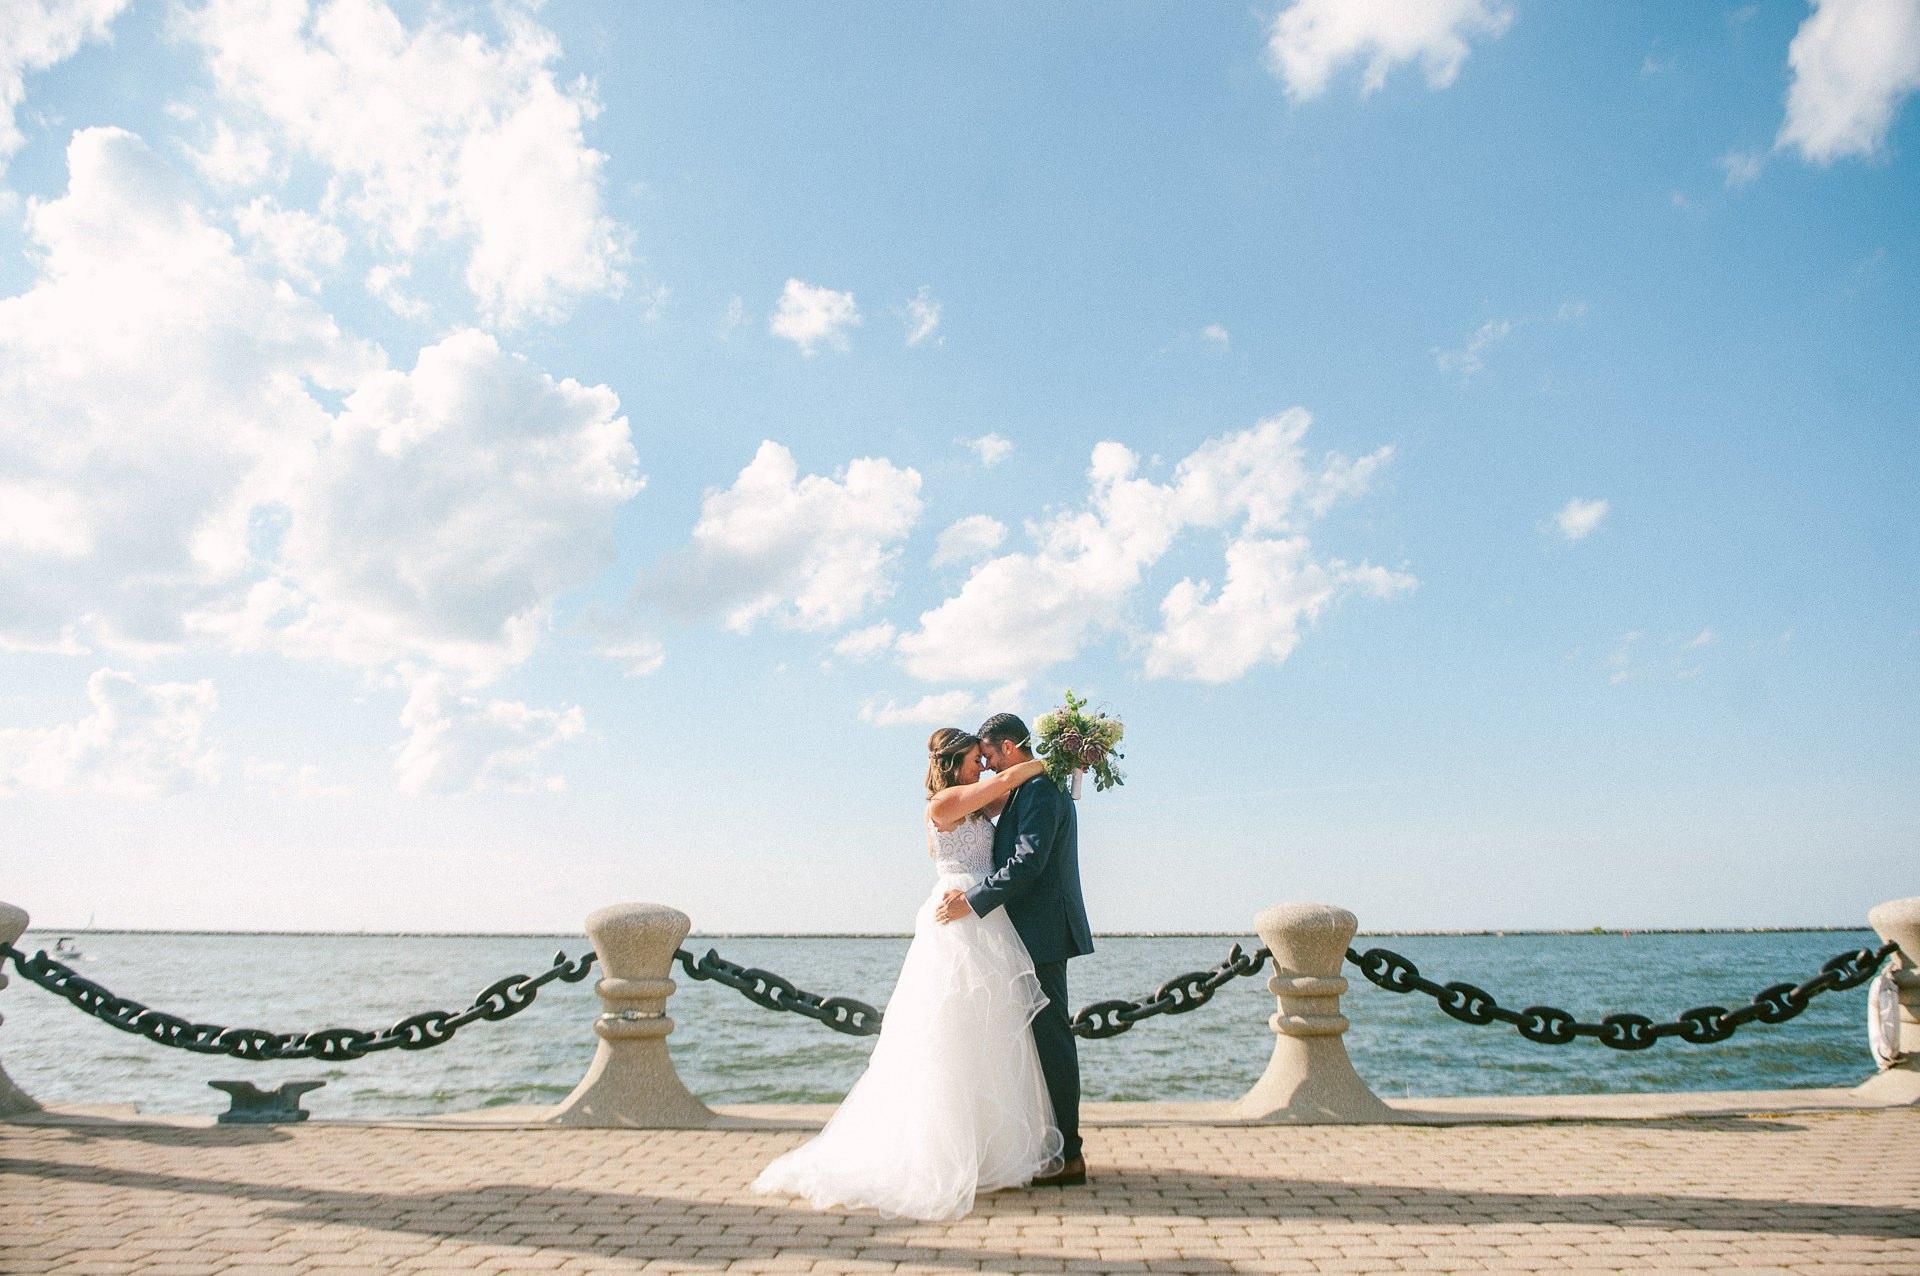 Nuevo Modern Mexican Wedding Photographer in Cleveland 1 1.jpg